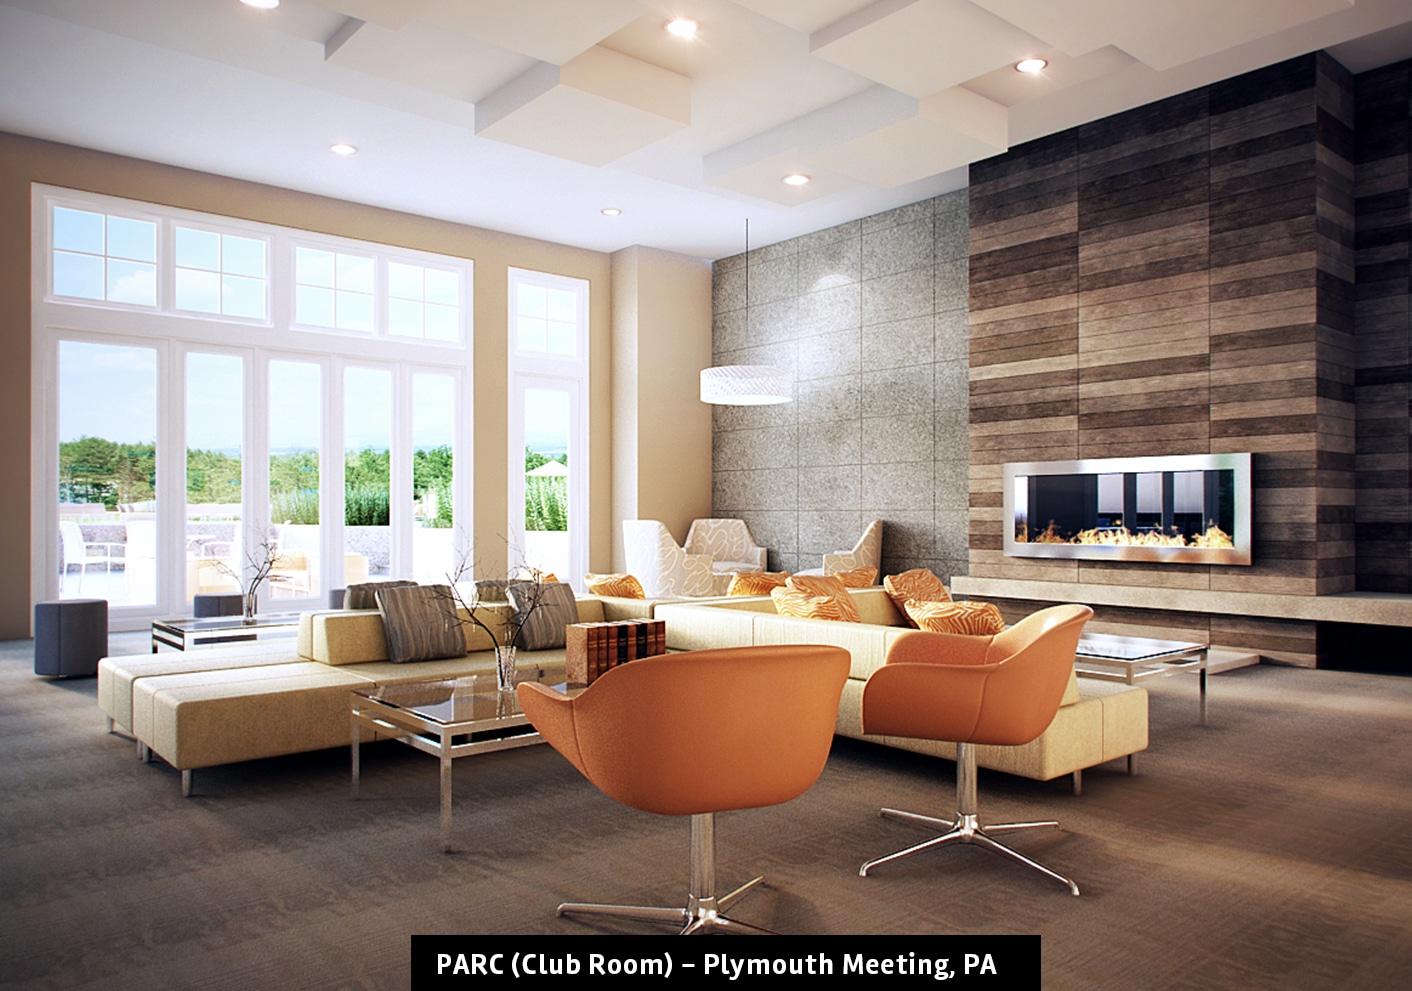 83 Interior Design Internships Philadelphia Pa Architecture Internships Philadelphia